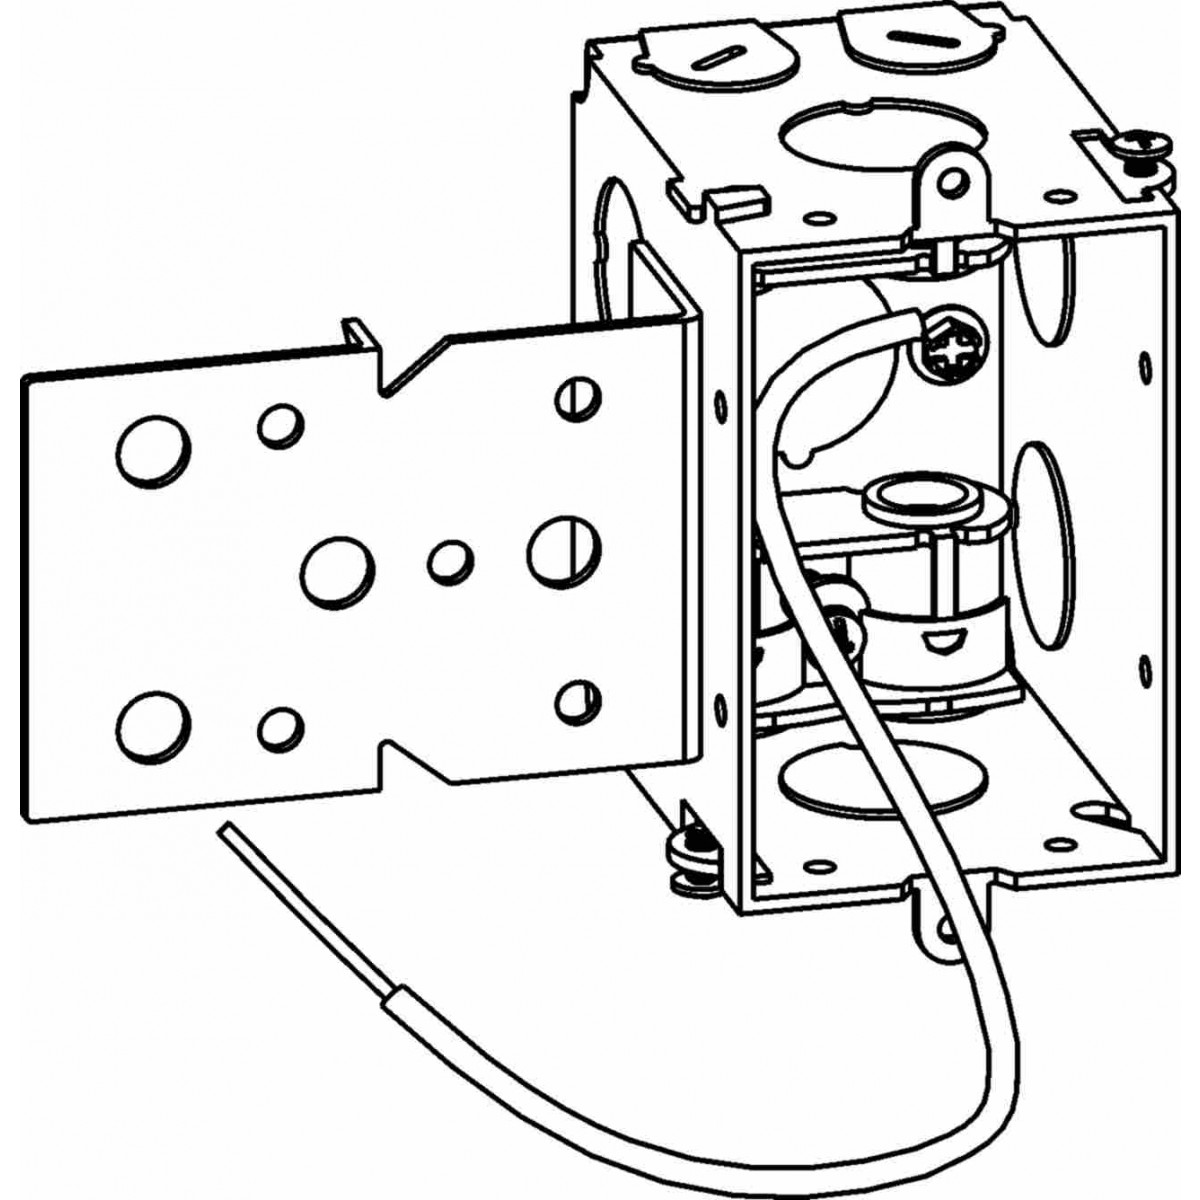 gmb-1-mc-b - gangable switch boxes